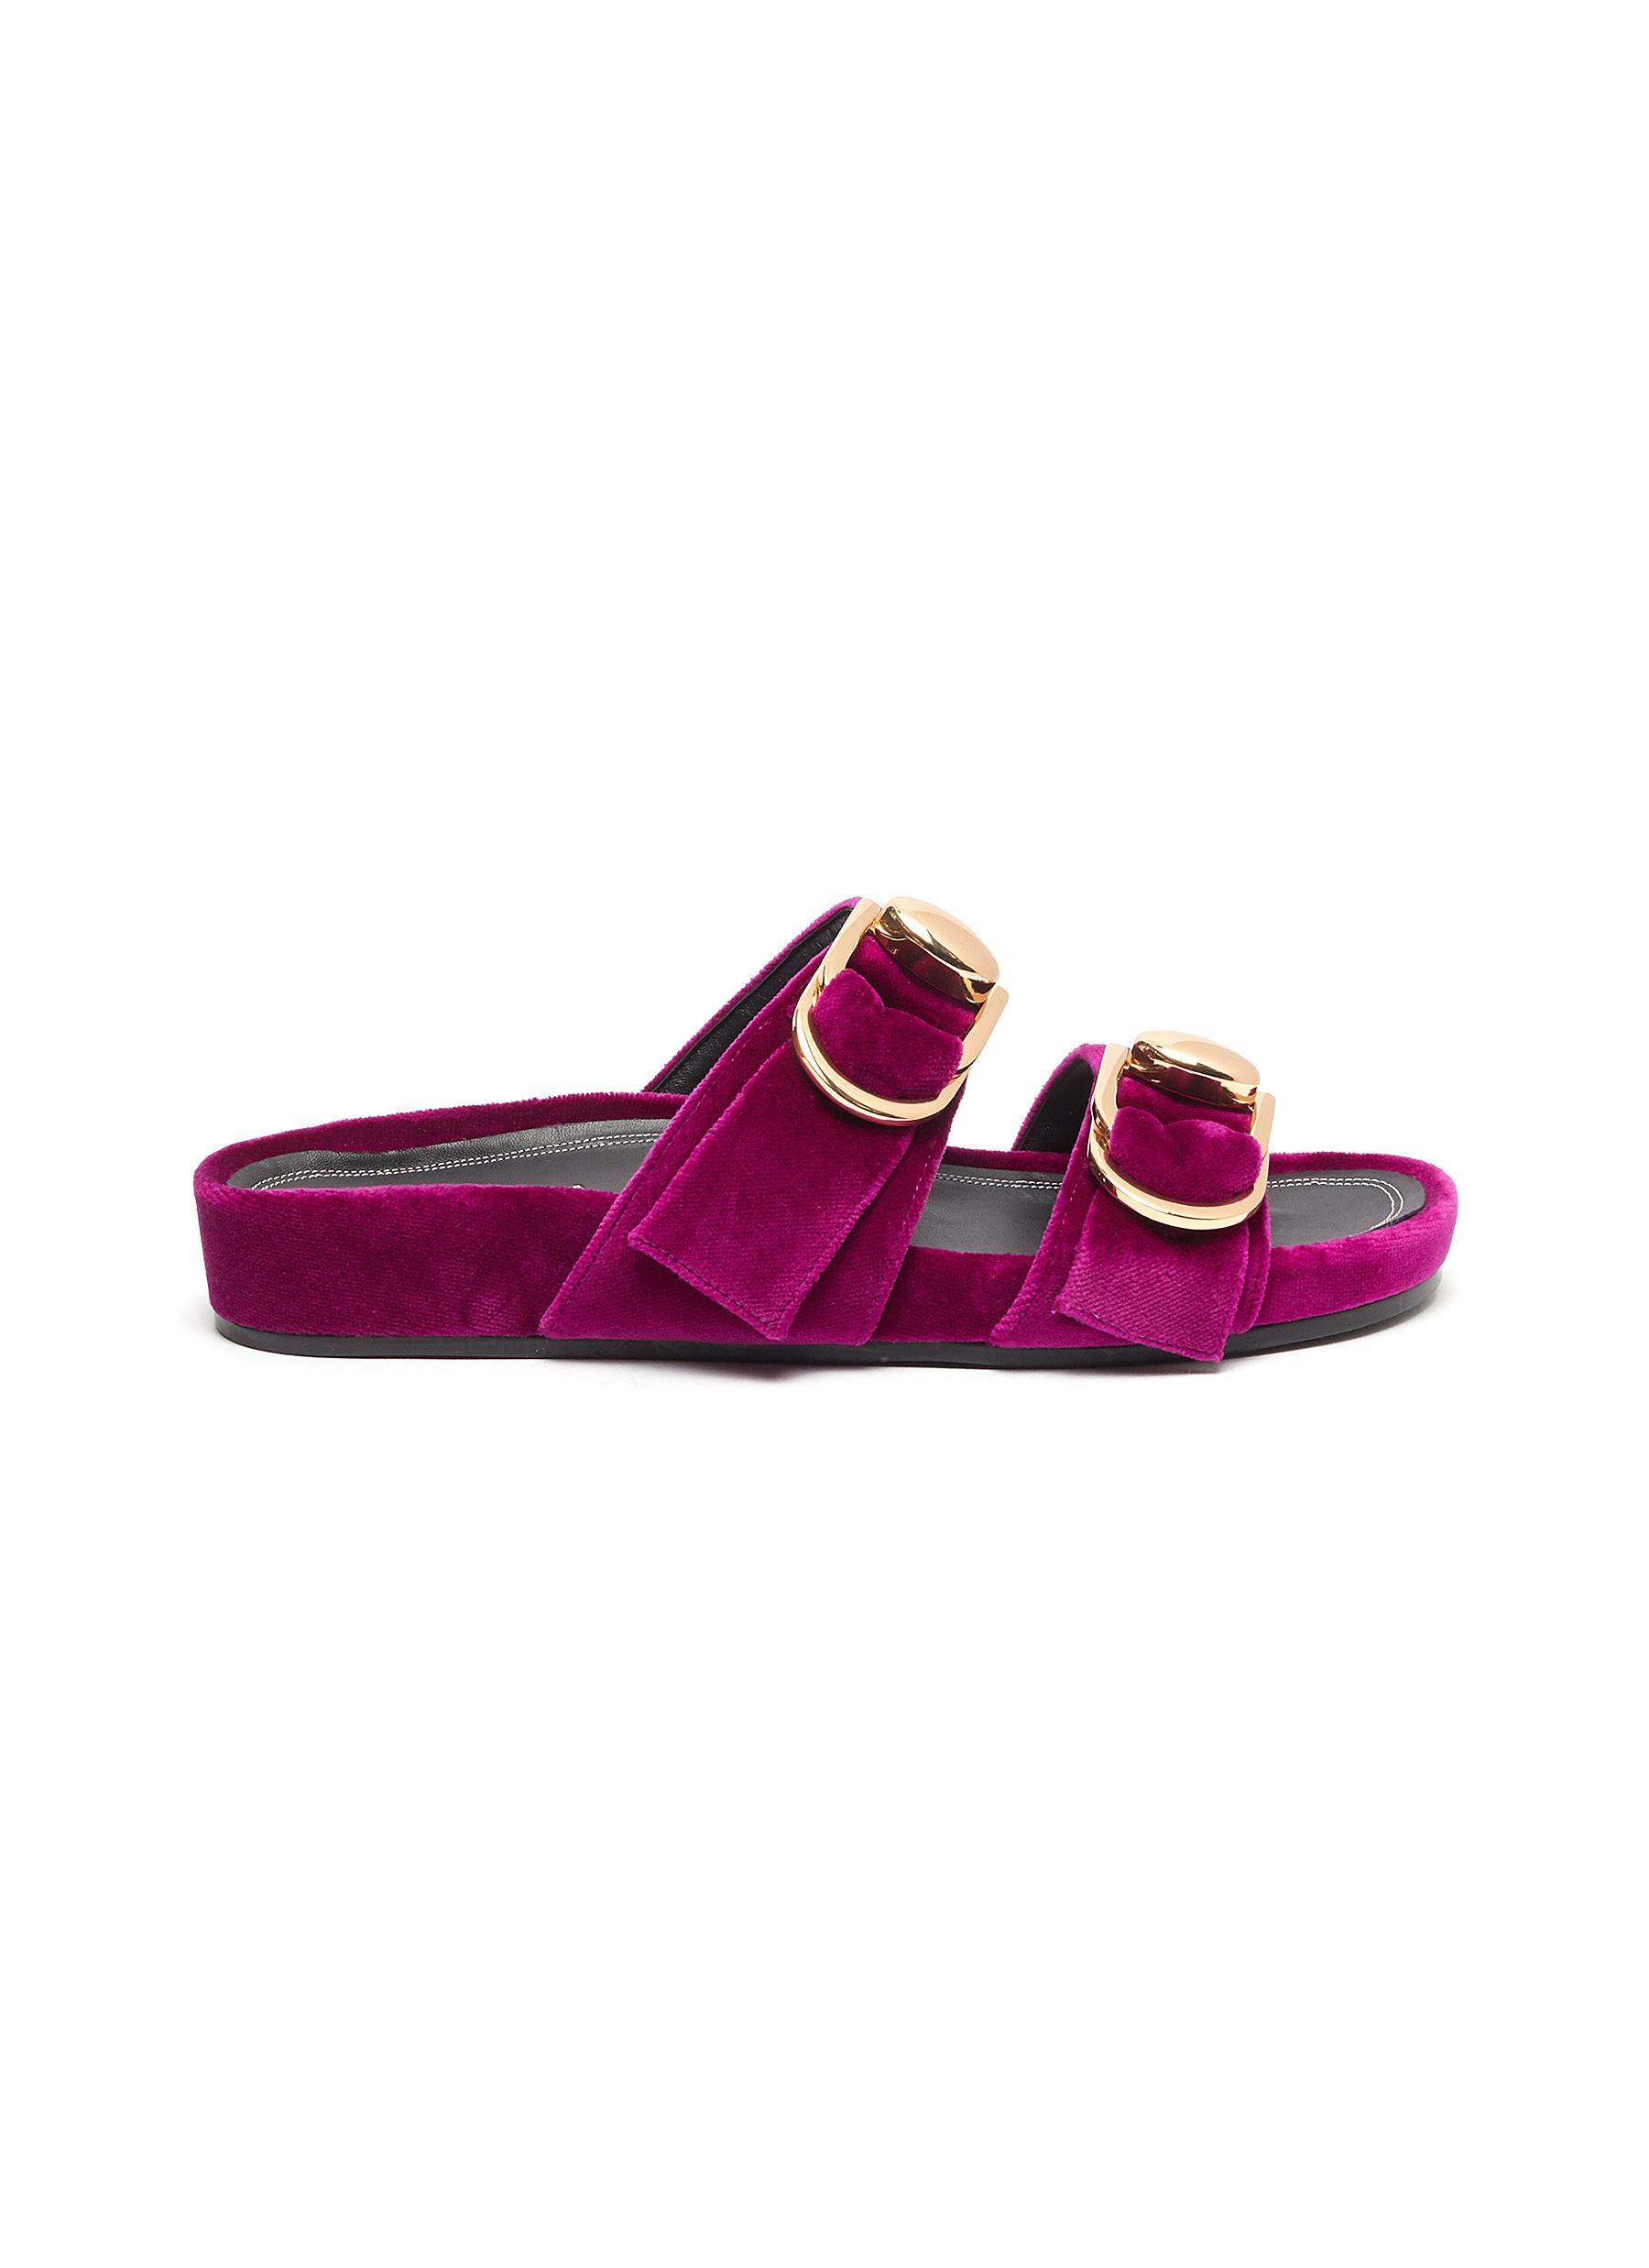 Turnlock buckle velvet slide sandals by Stella Luna